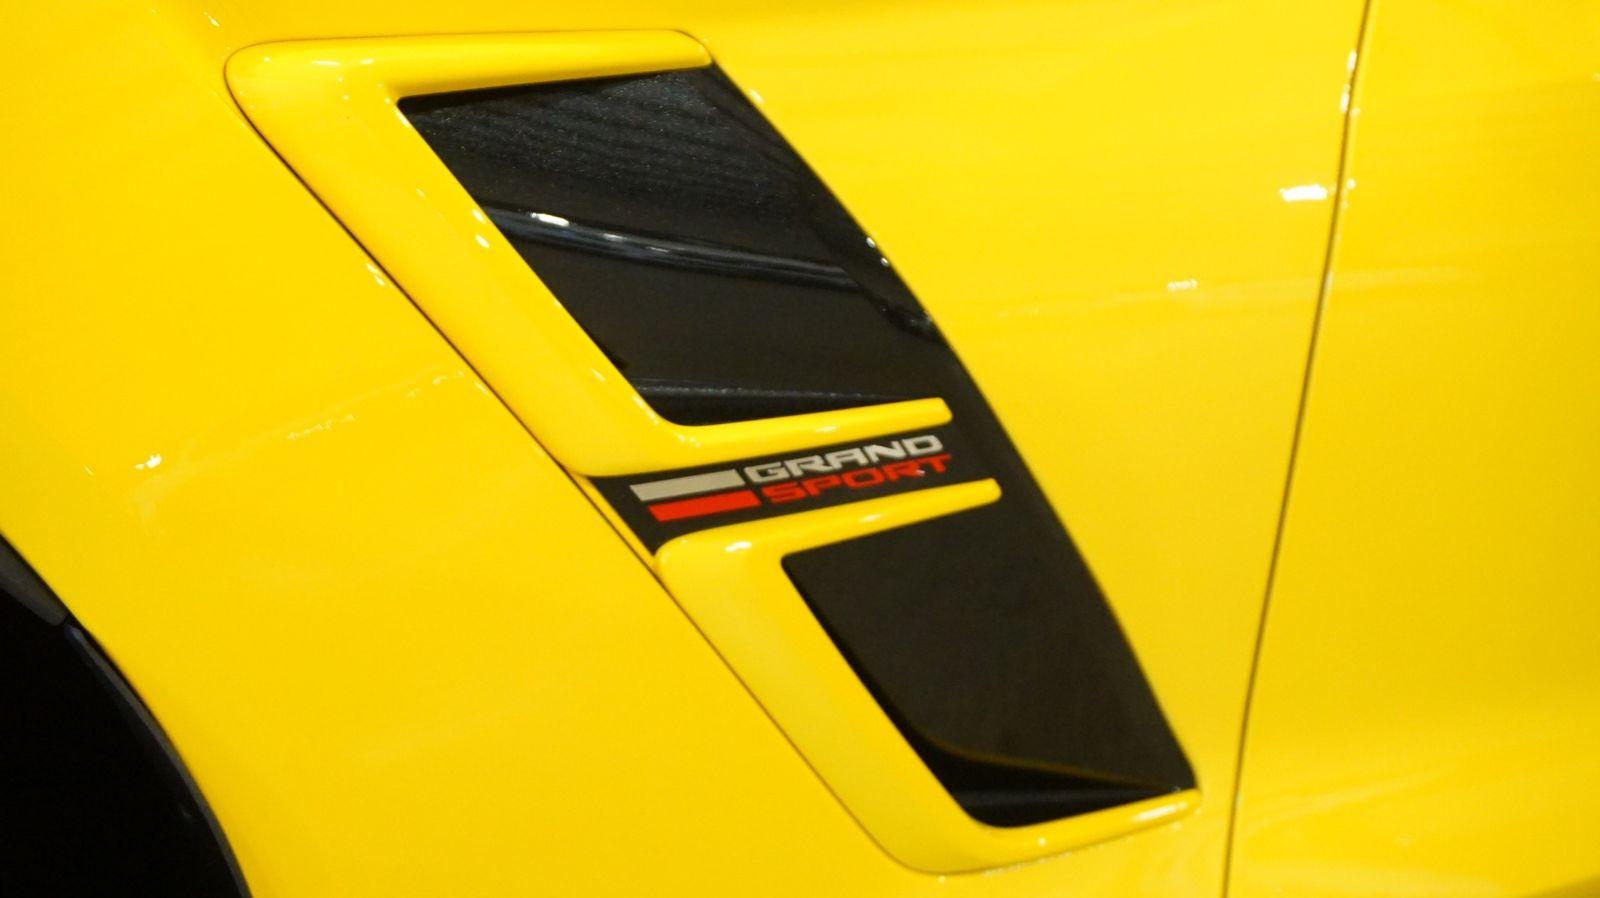 2017 Yellow Chevrolet Corvette Grand Sport 1LT | C7 Corvette Photo 2